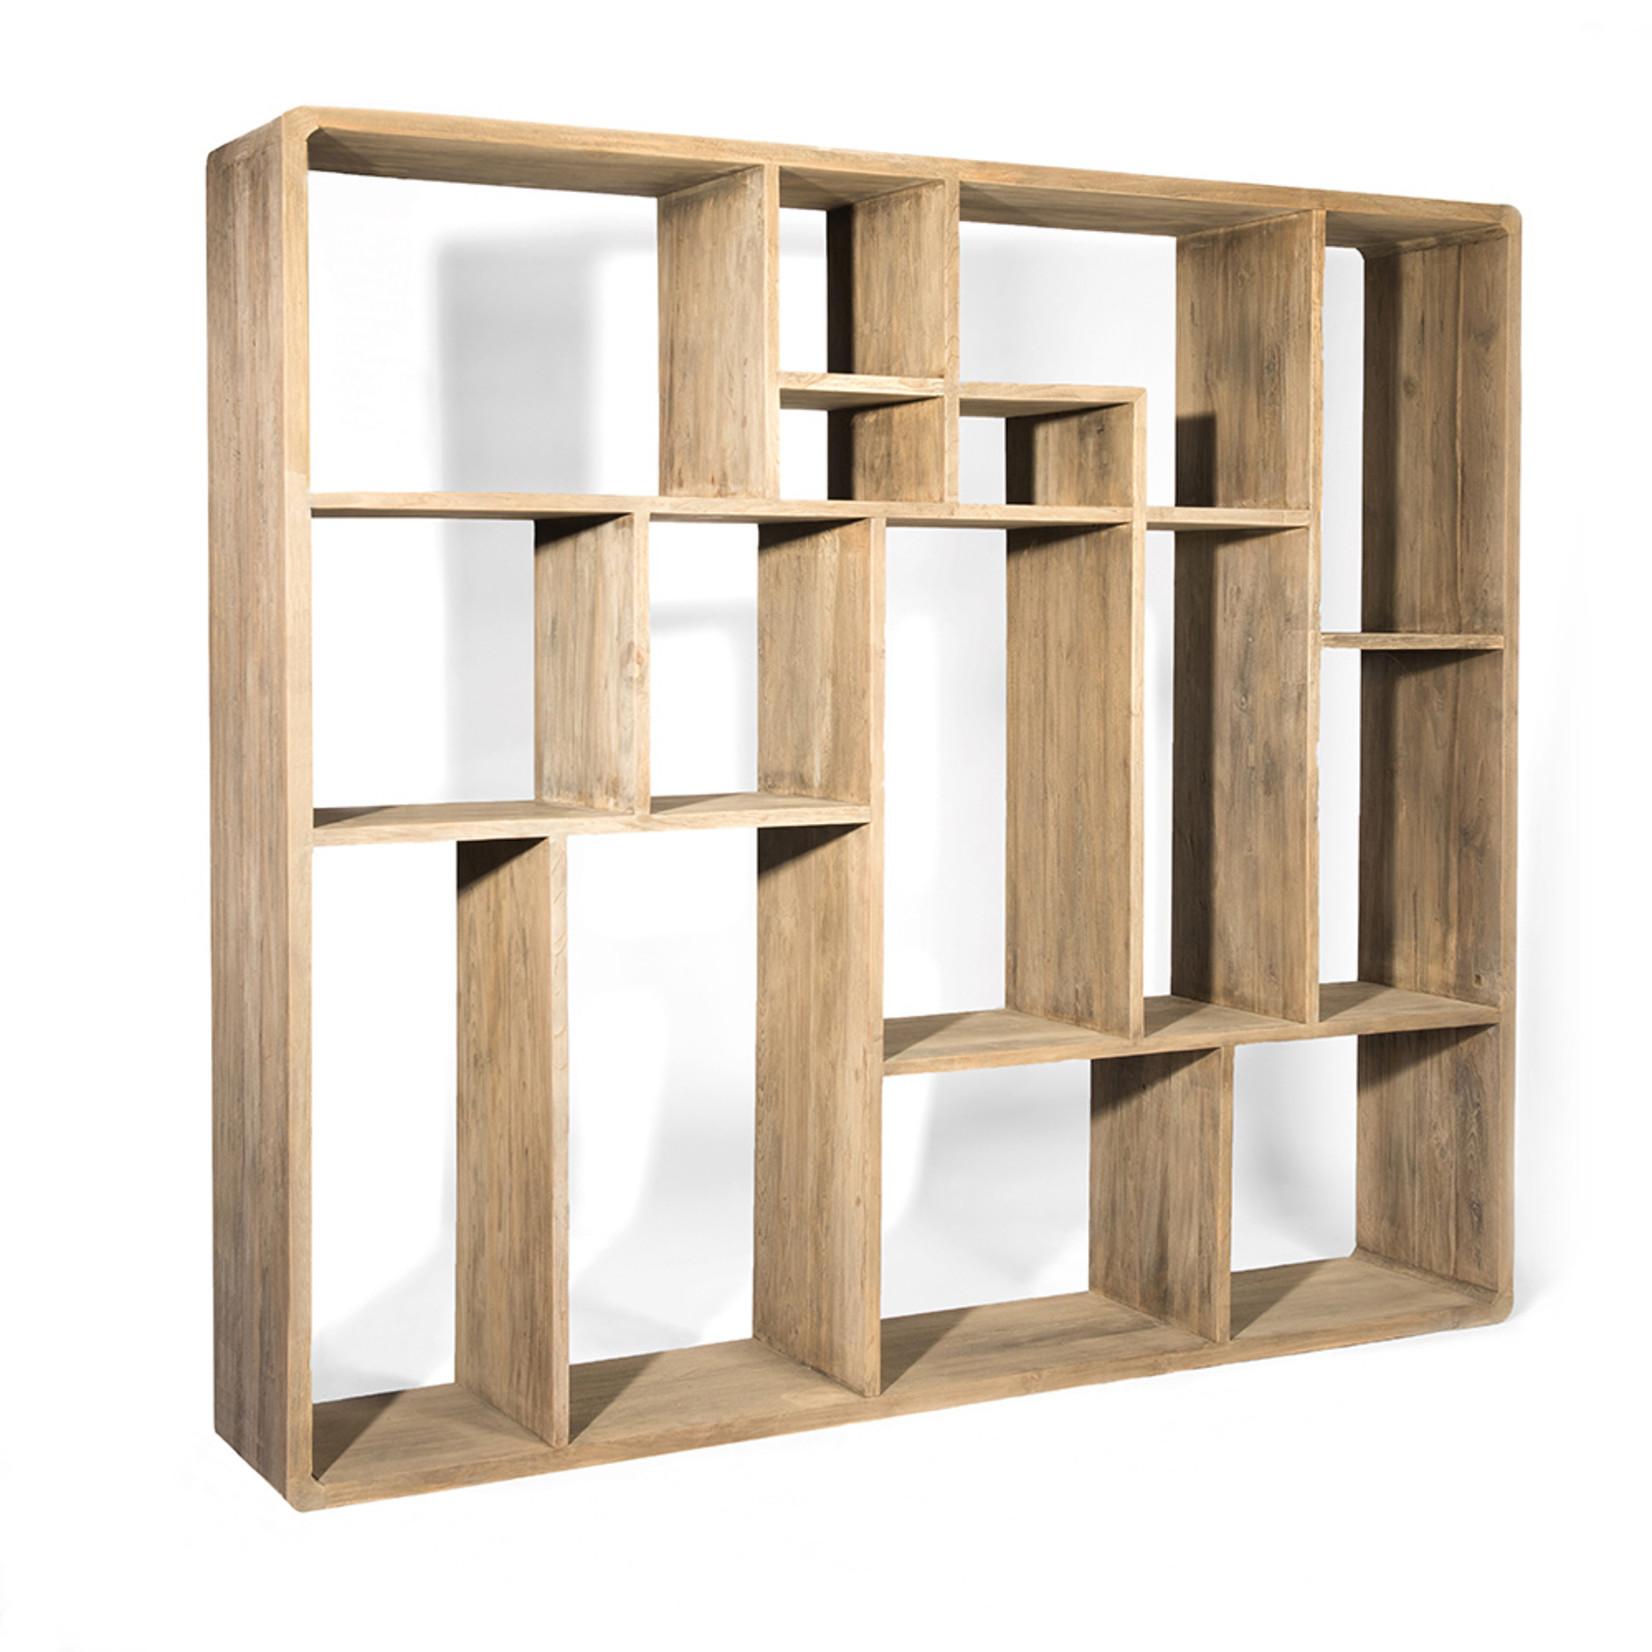 Gommaire Cabinet Saar Large | Reclaimed Teak Authentic Gray